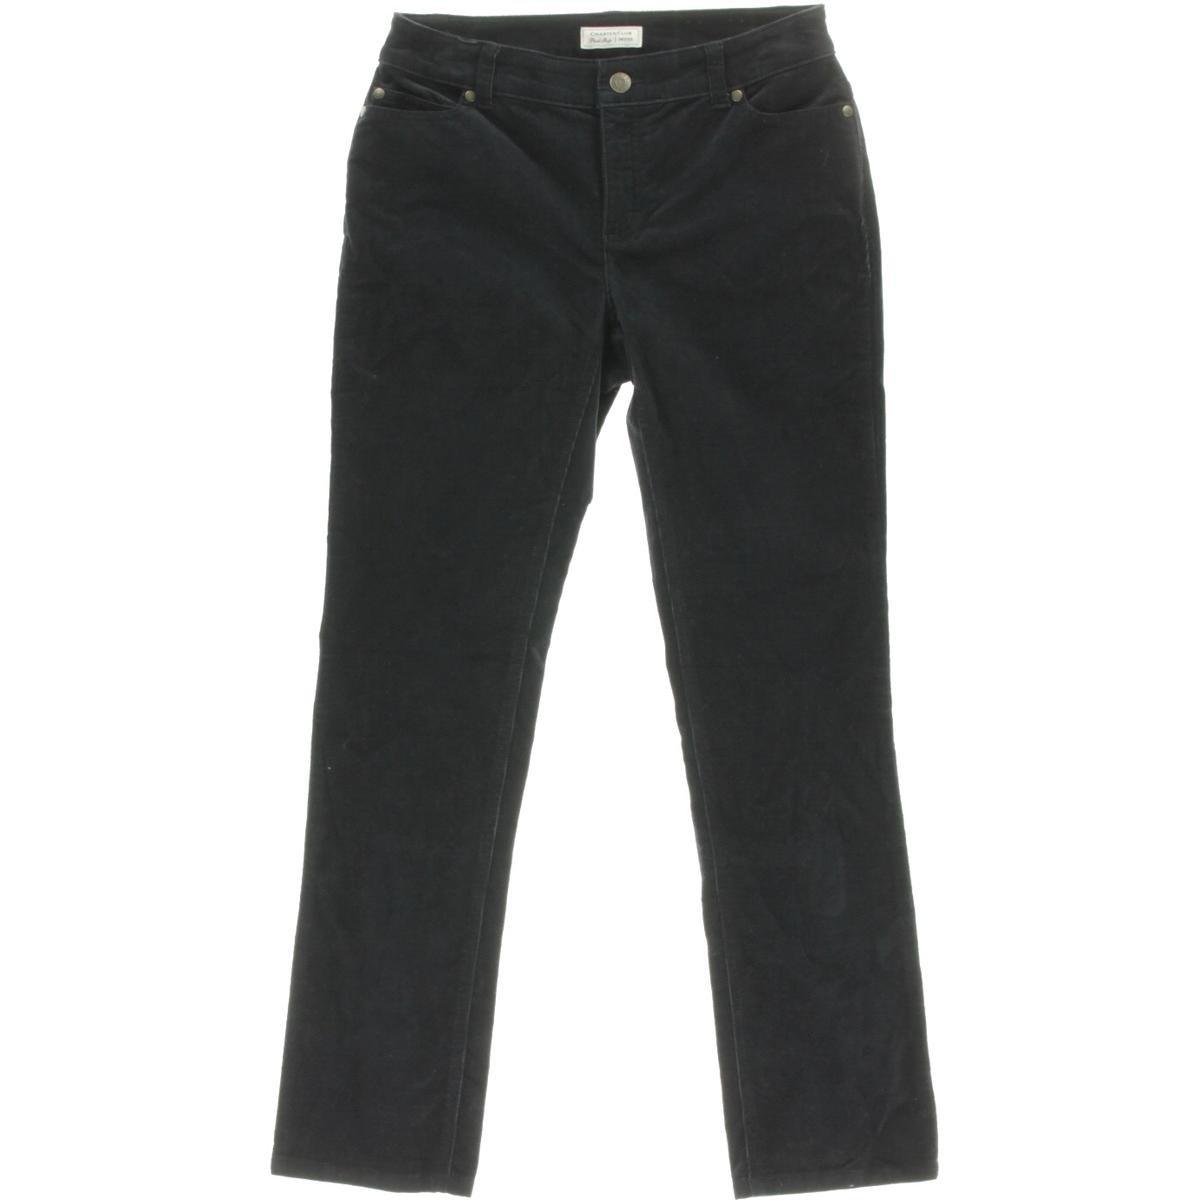 CHARTER CLUB Womens New 1468 Navy Straight Leg Casual Pants Petites 16 B+B 46027EY143